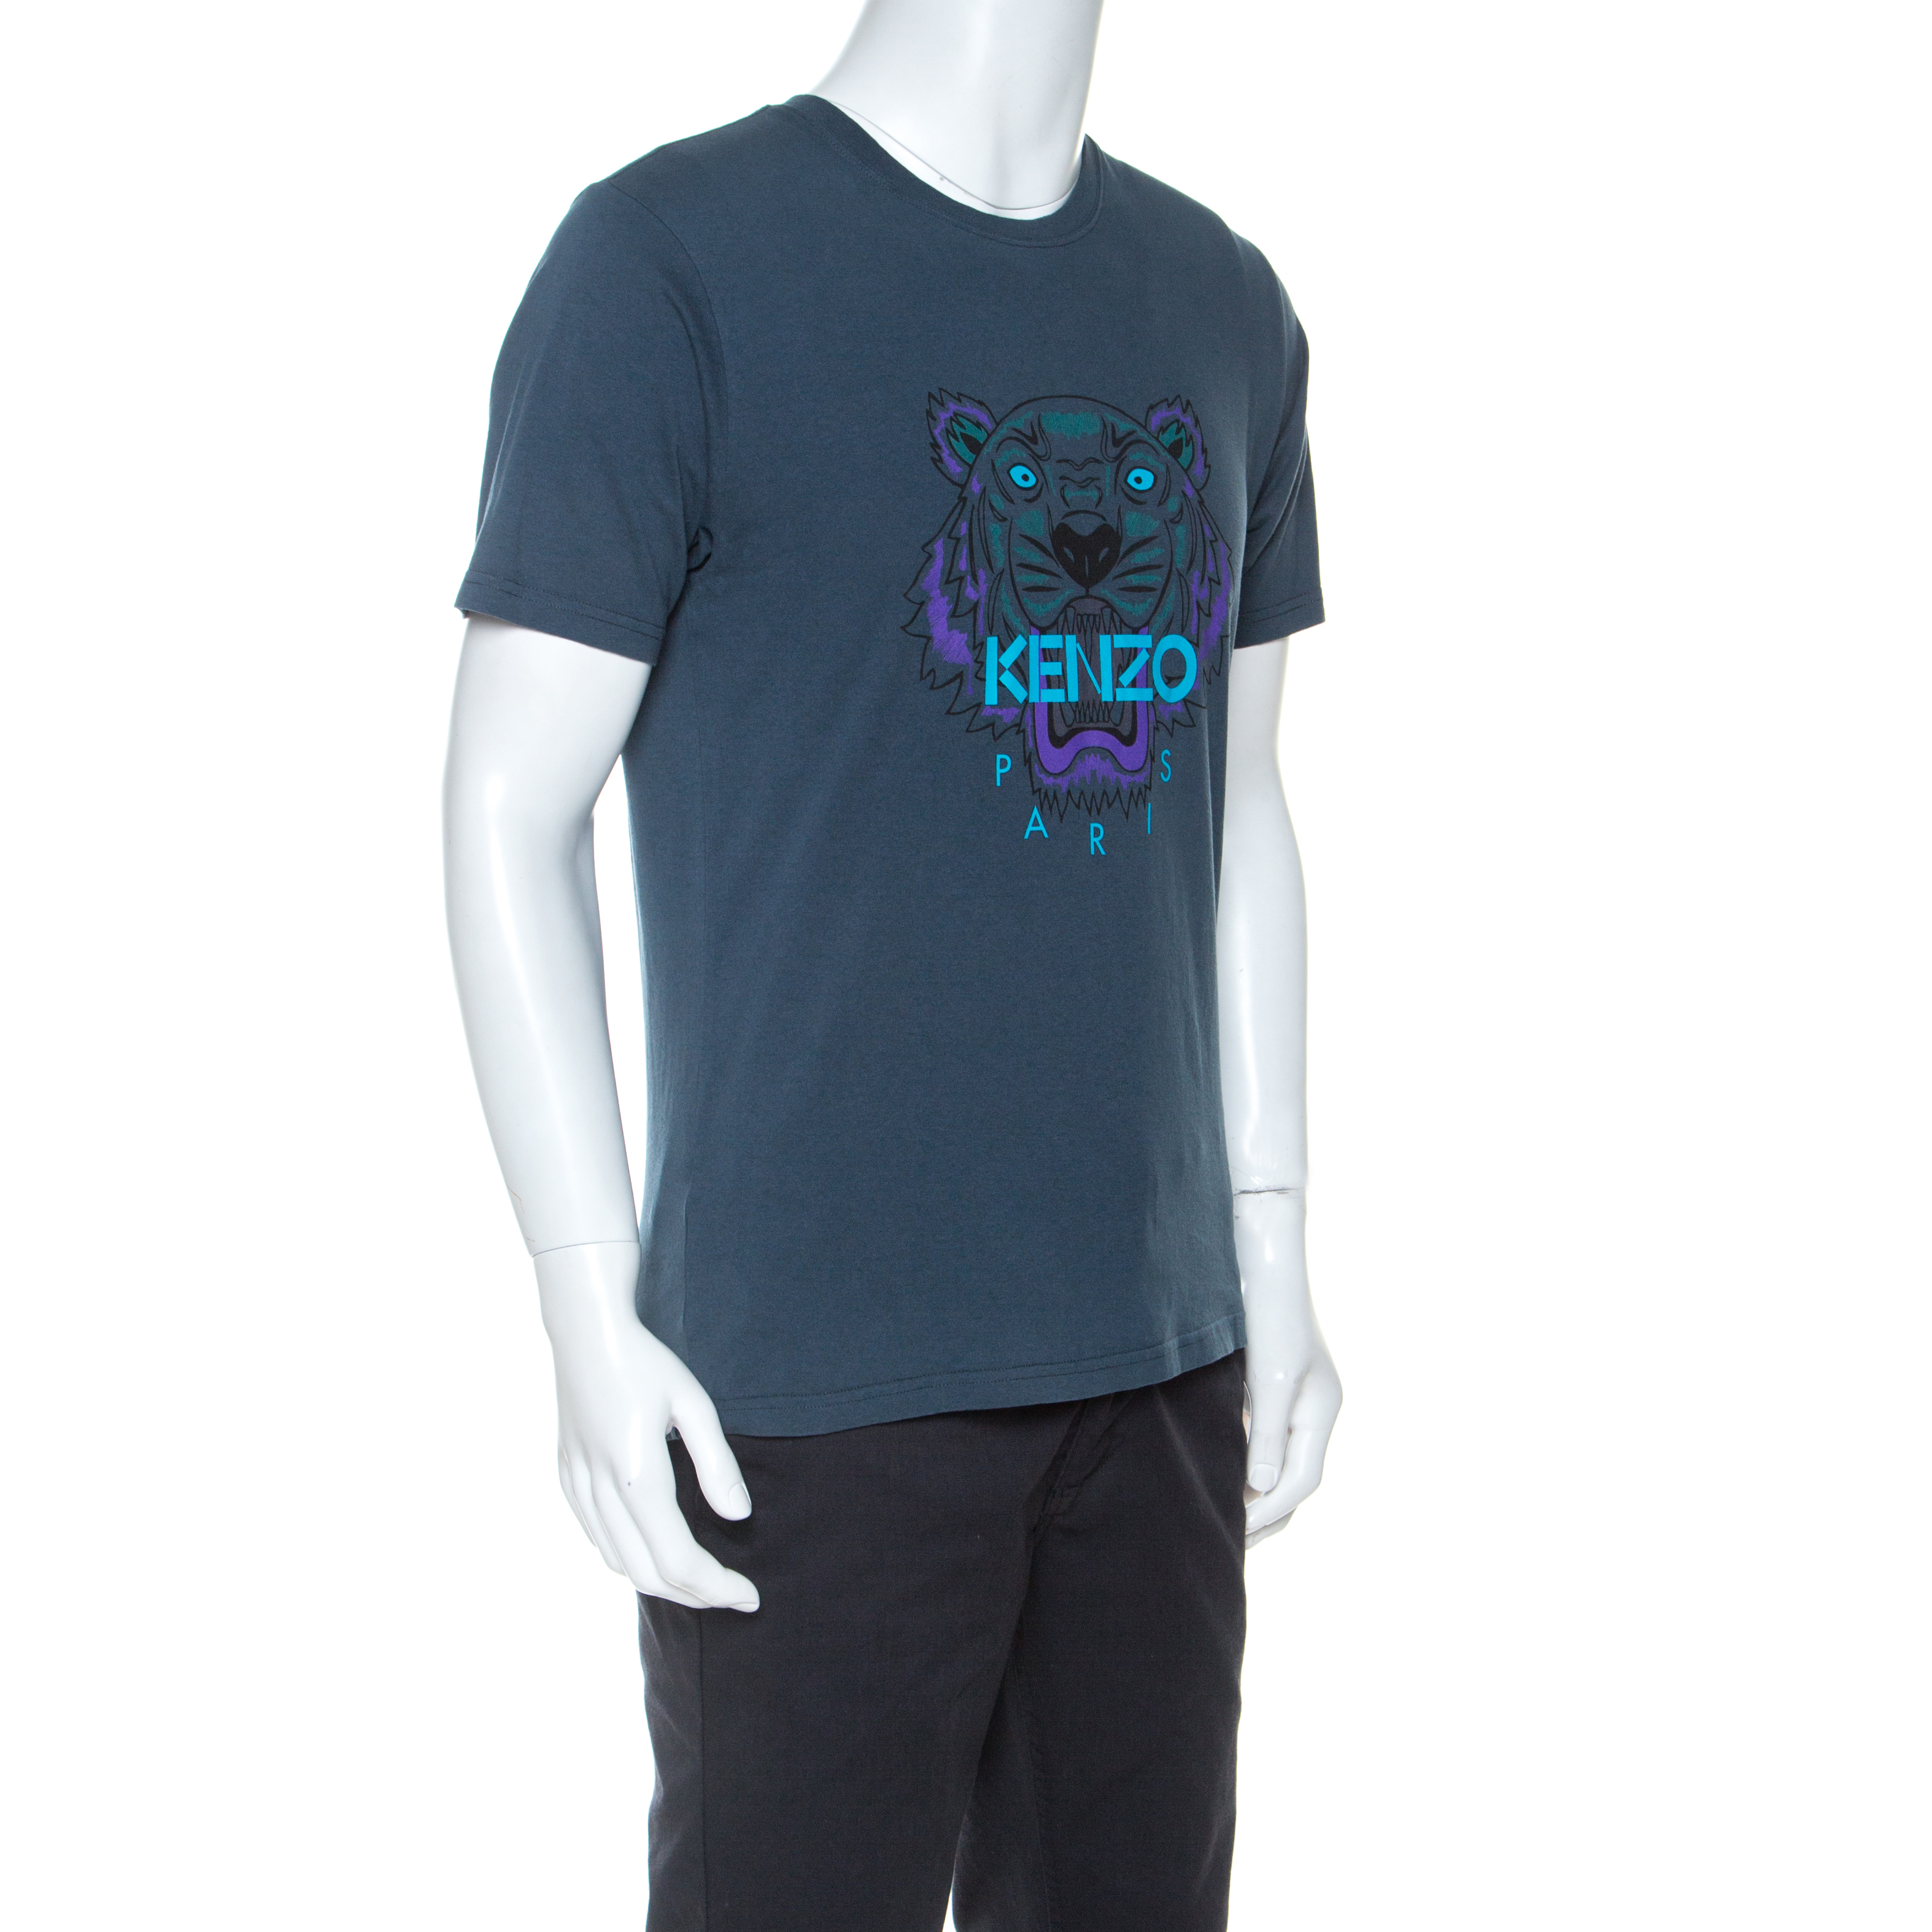 Kenzo Vert Coton Motif De Tigre D'Impression T-Shirt M